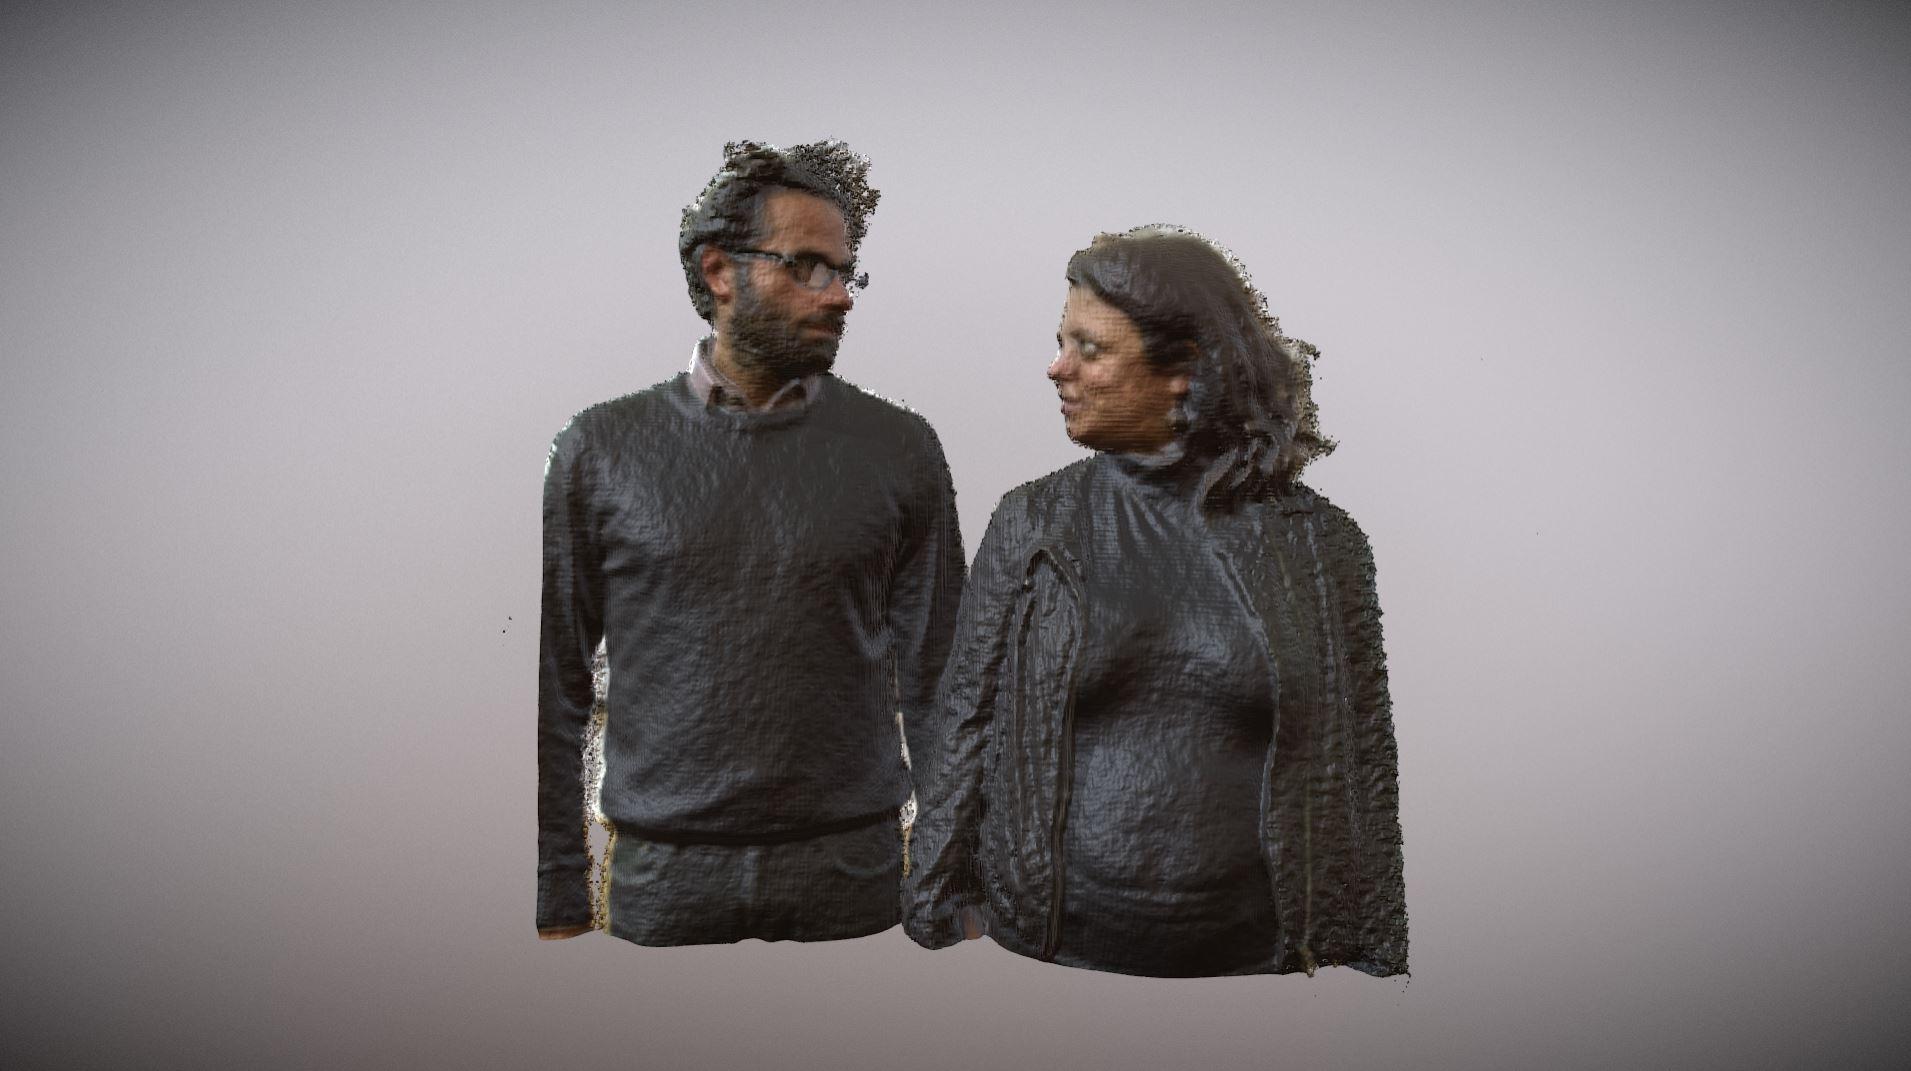 Francesco&Giulia 1.JPG